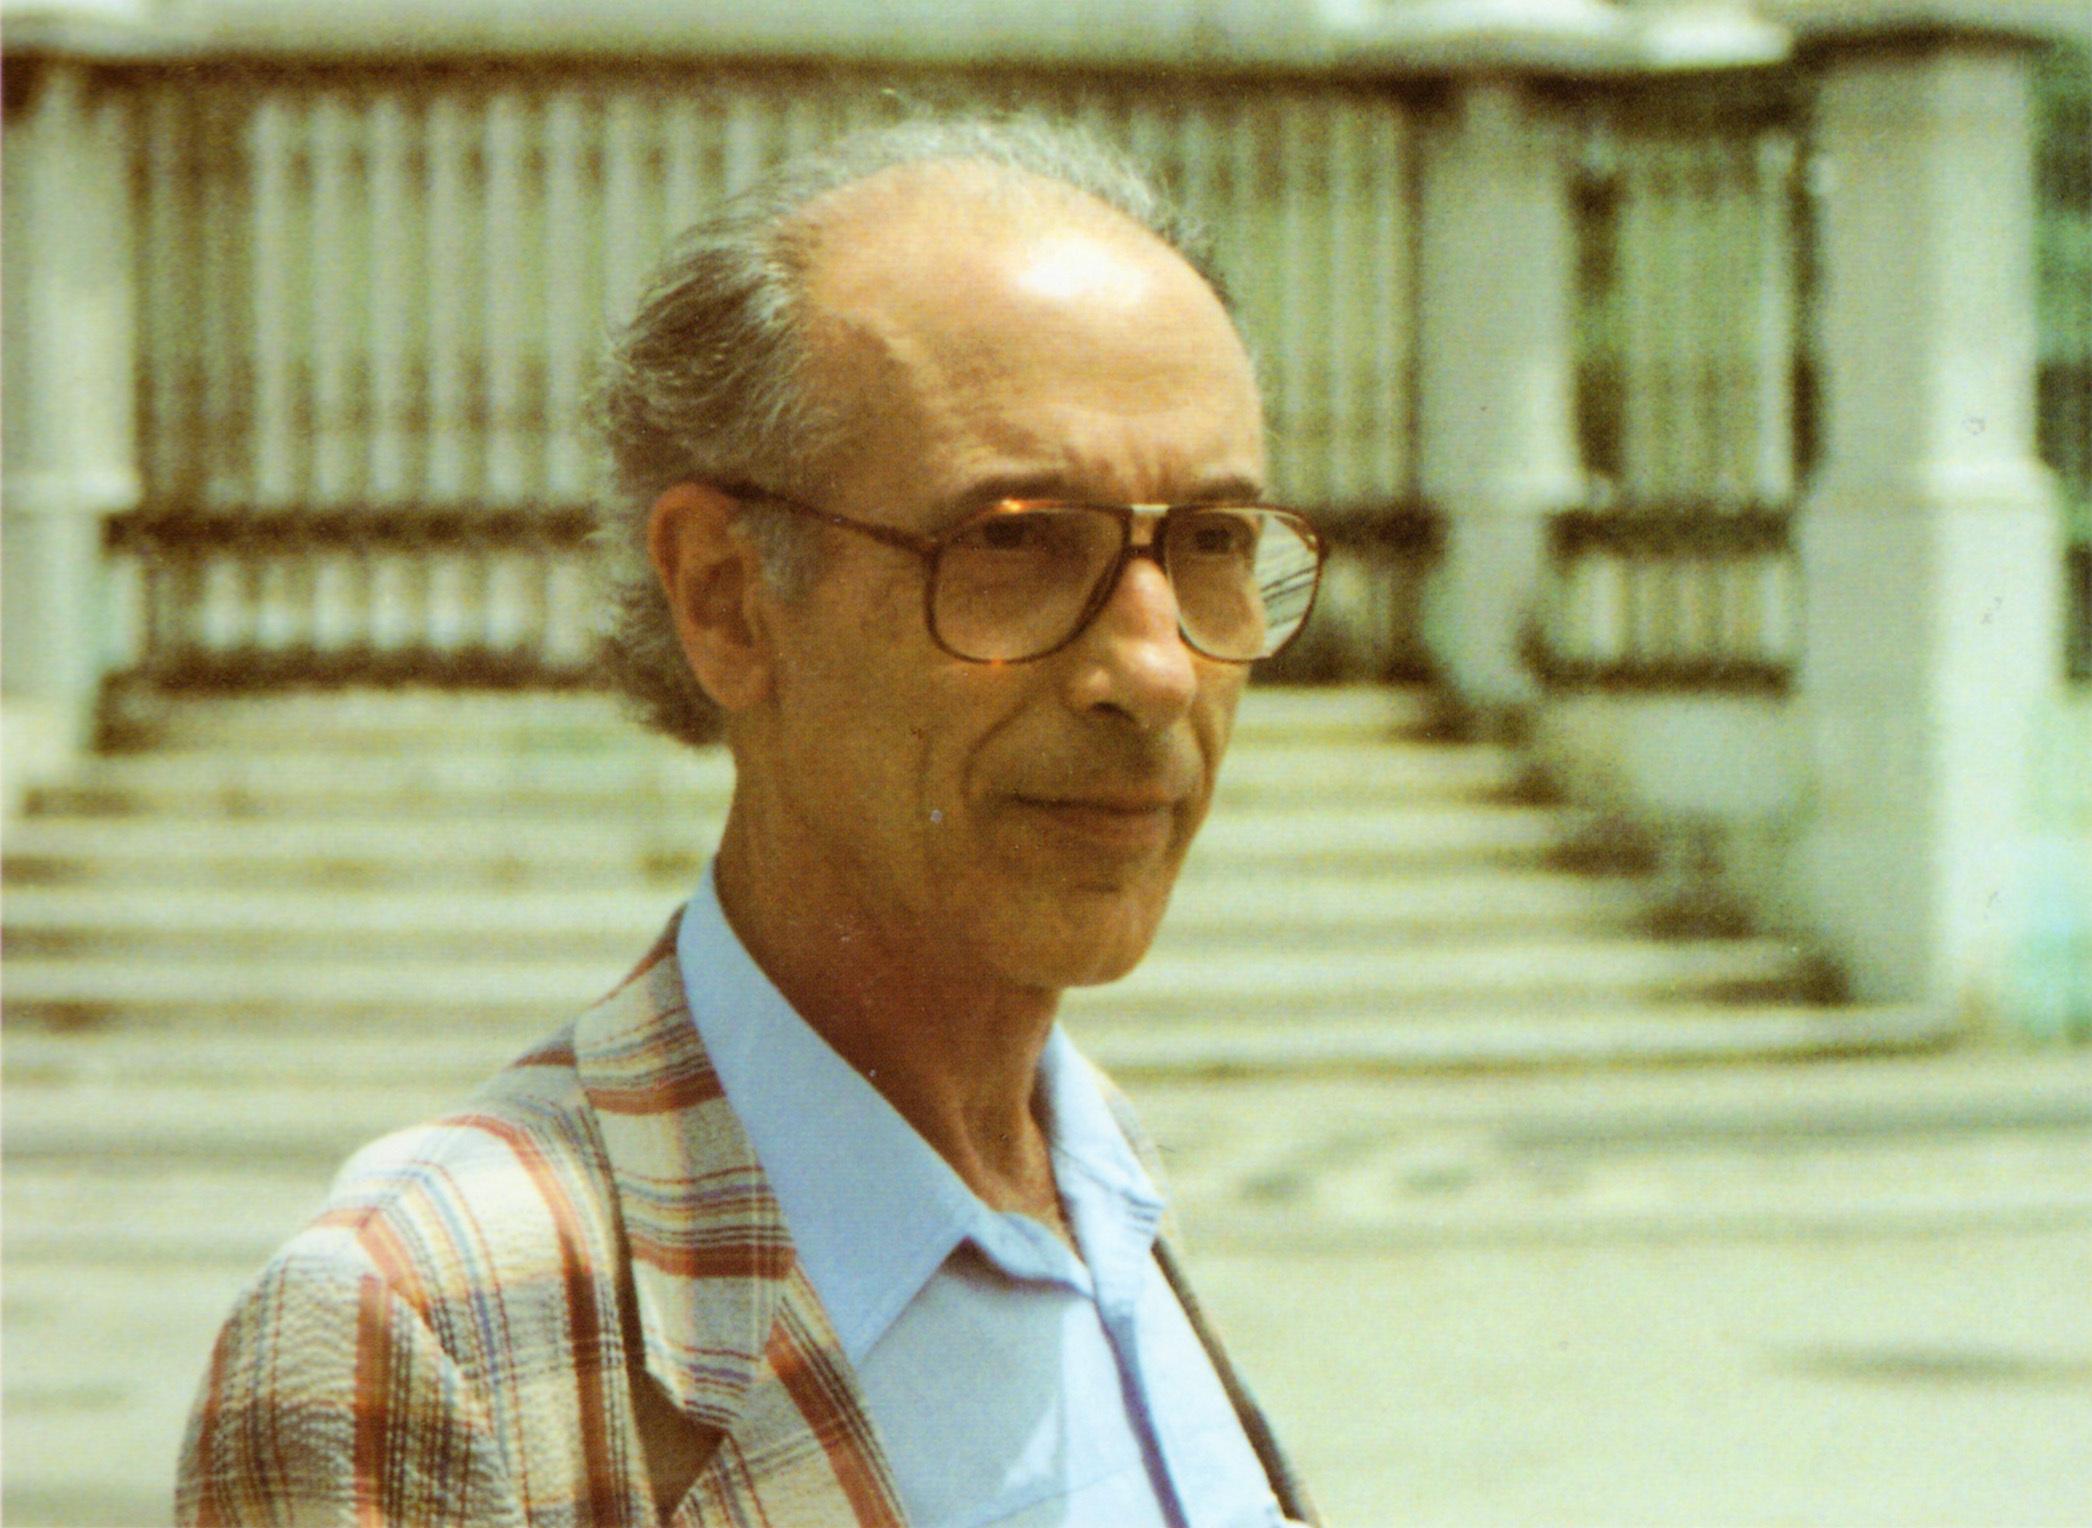 Vasco Granja homenageado no Alvalade Cineclube